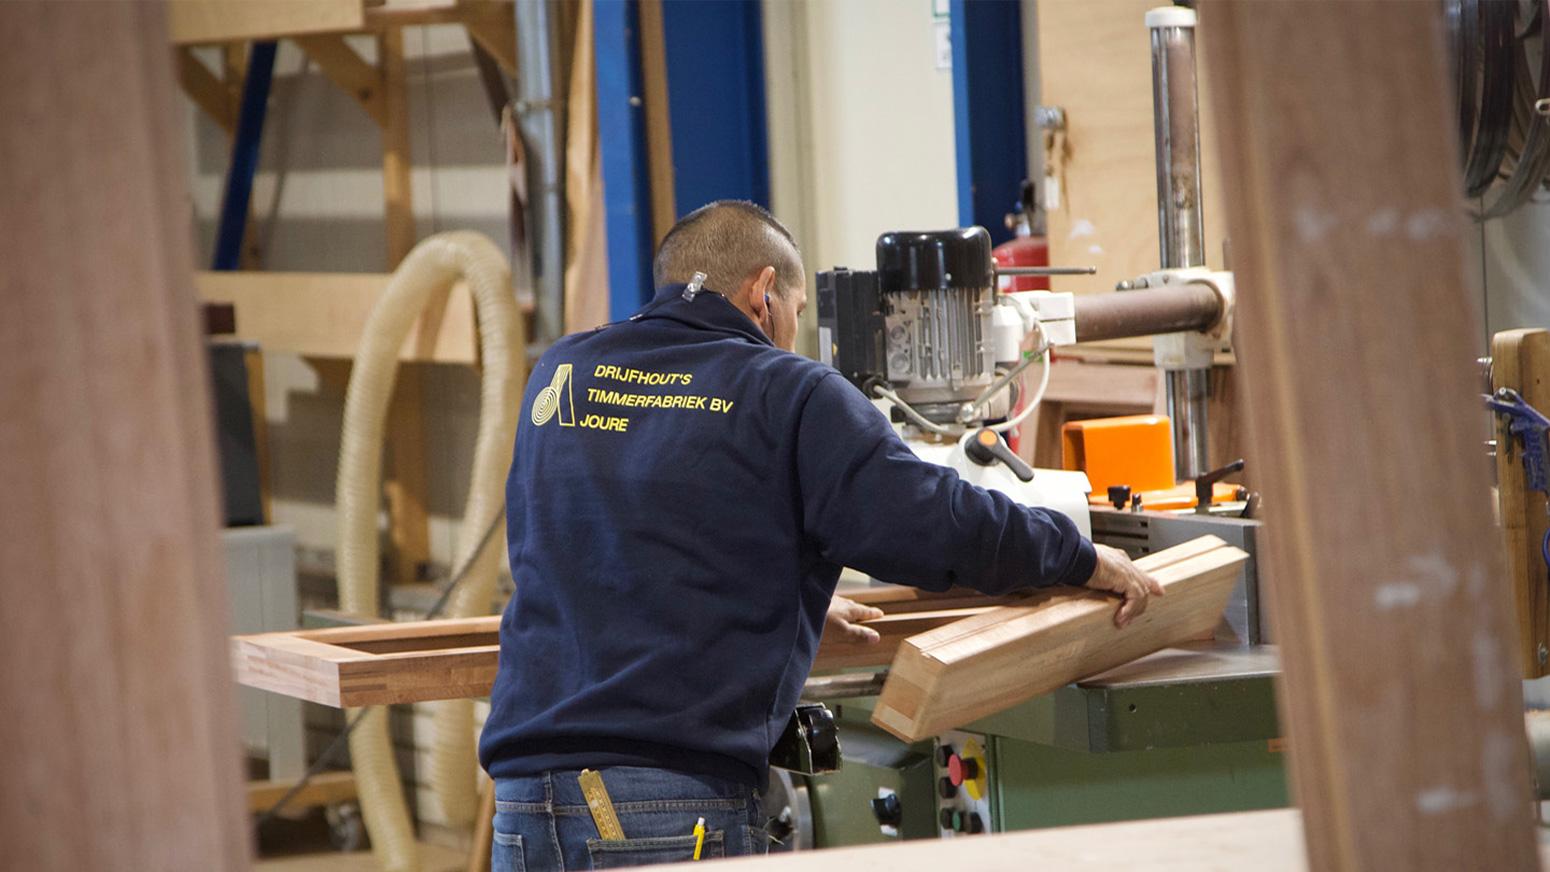 Werkplaats Drijfhout's Timmerfabriek BV